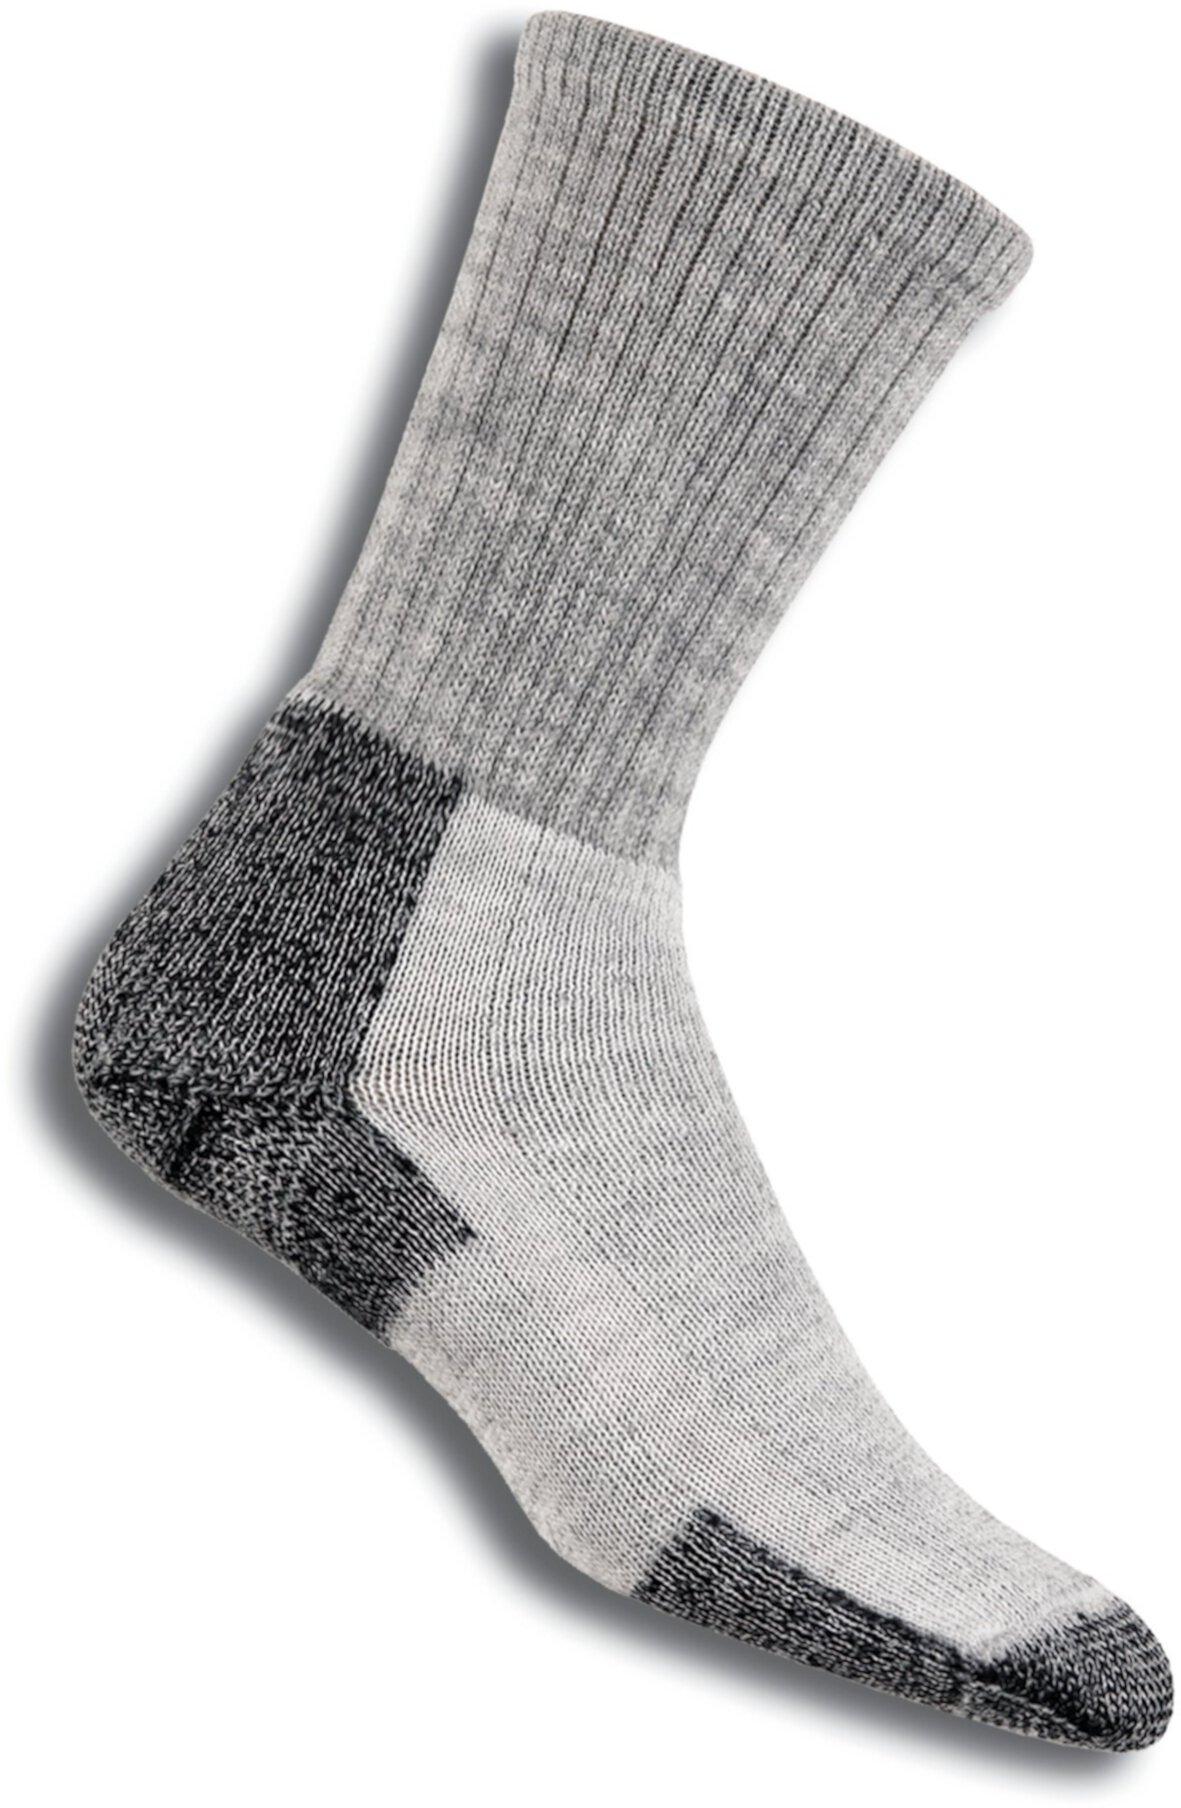 Klt Max Cushion Hiking Crew Socks Thorlos